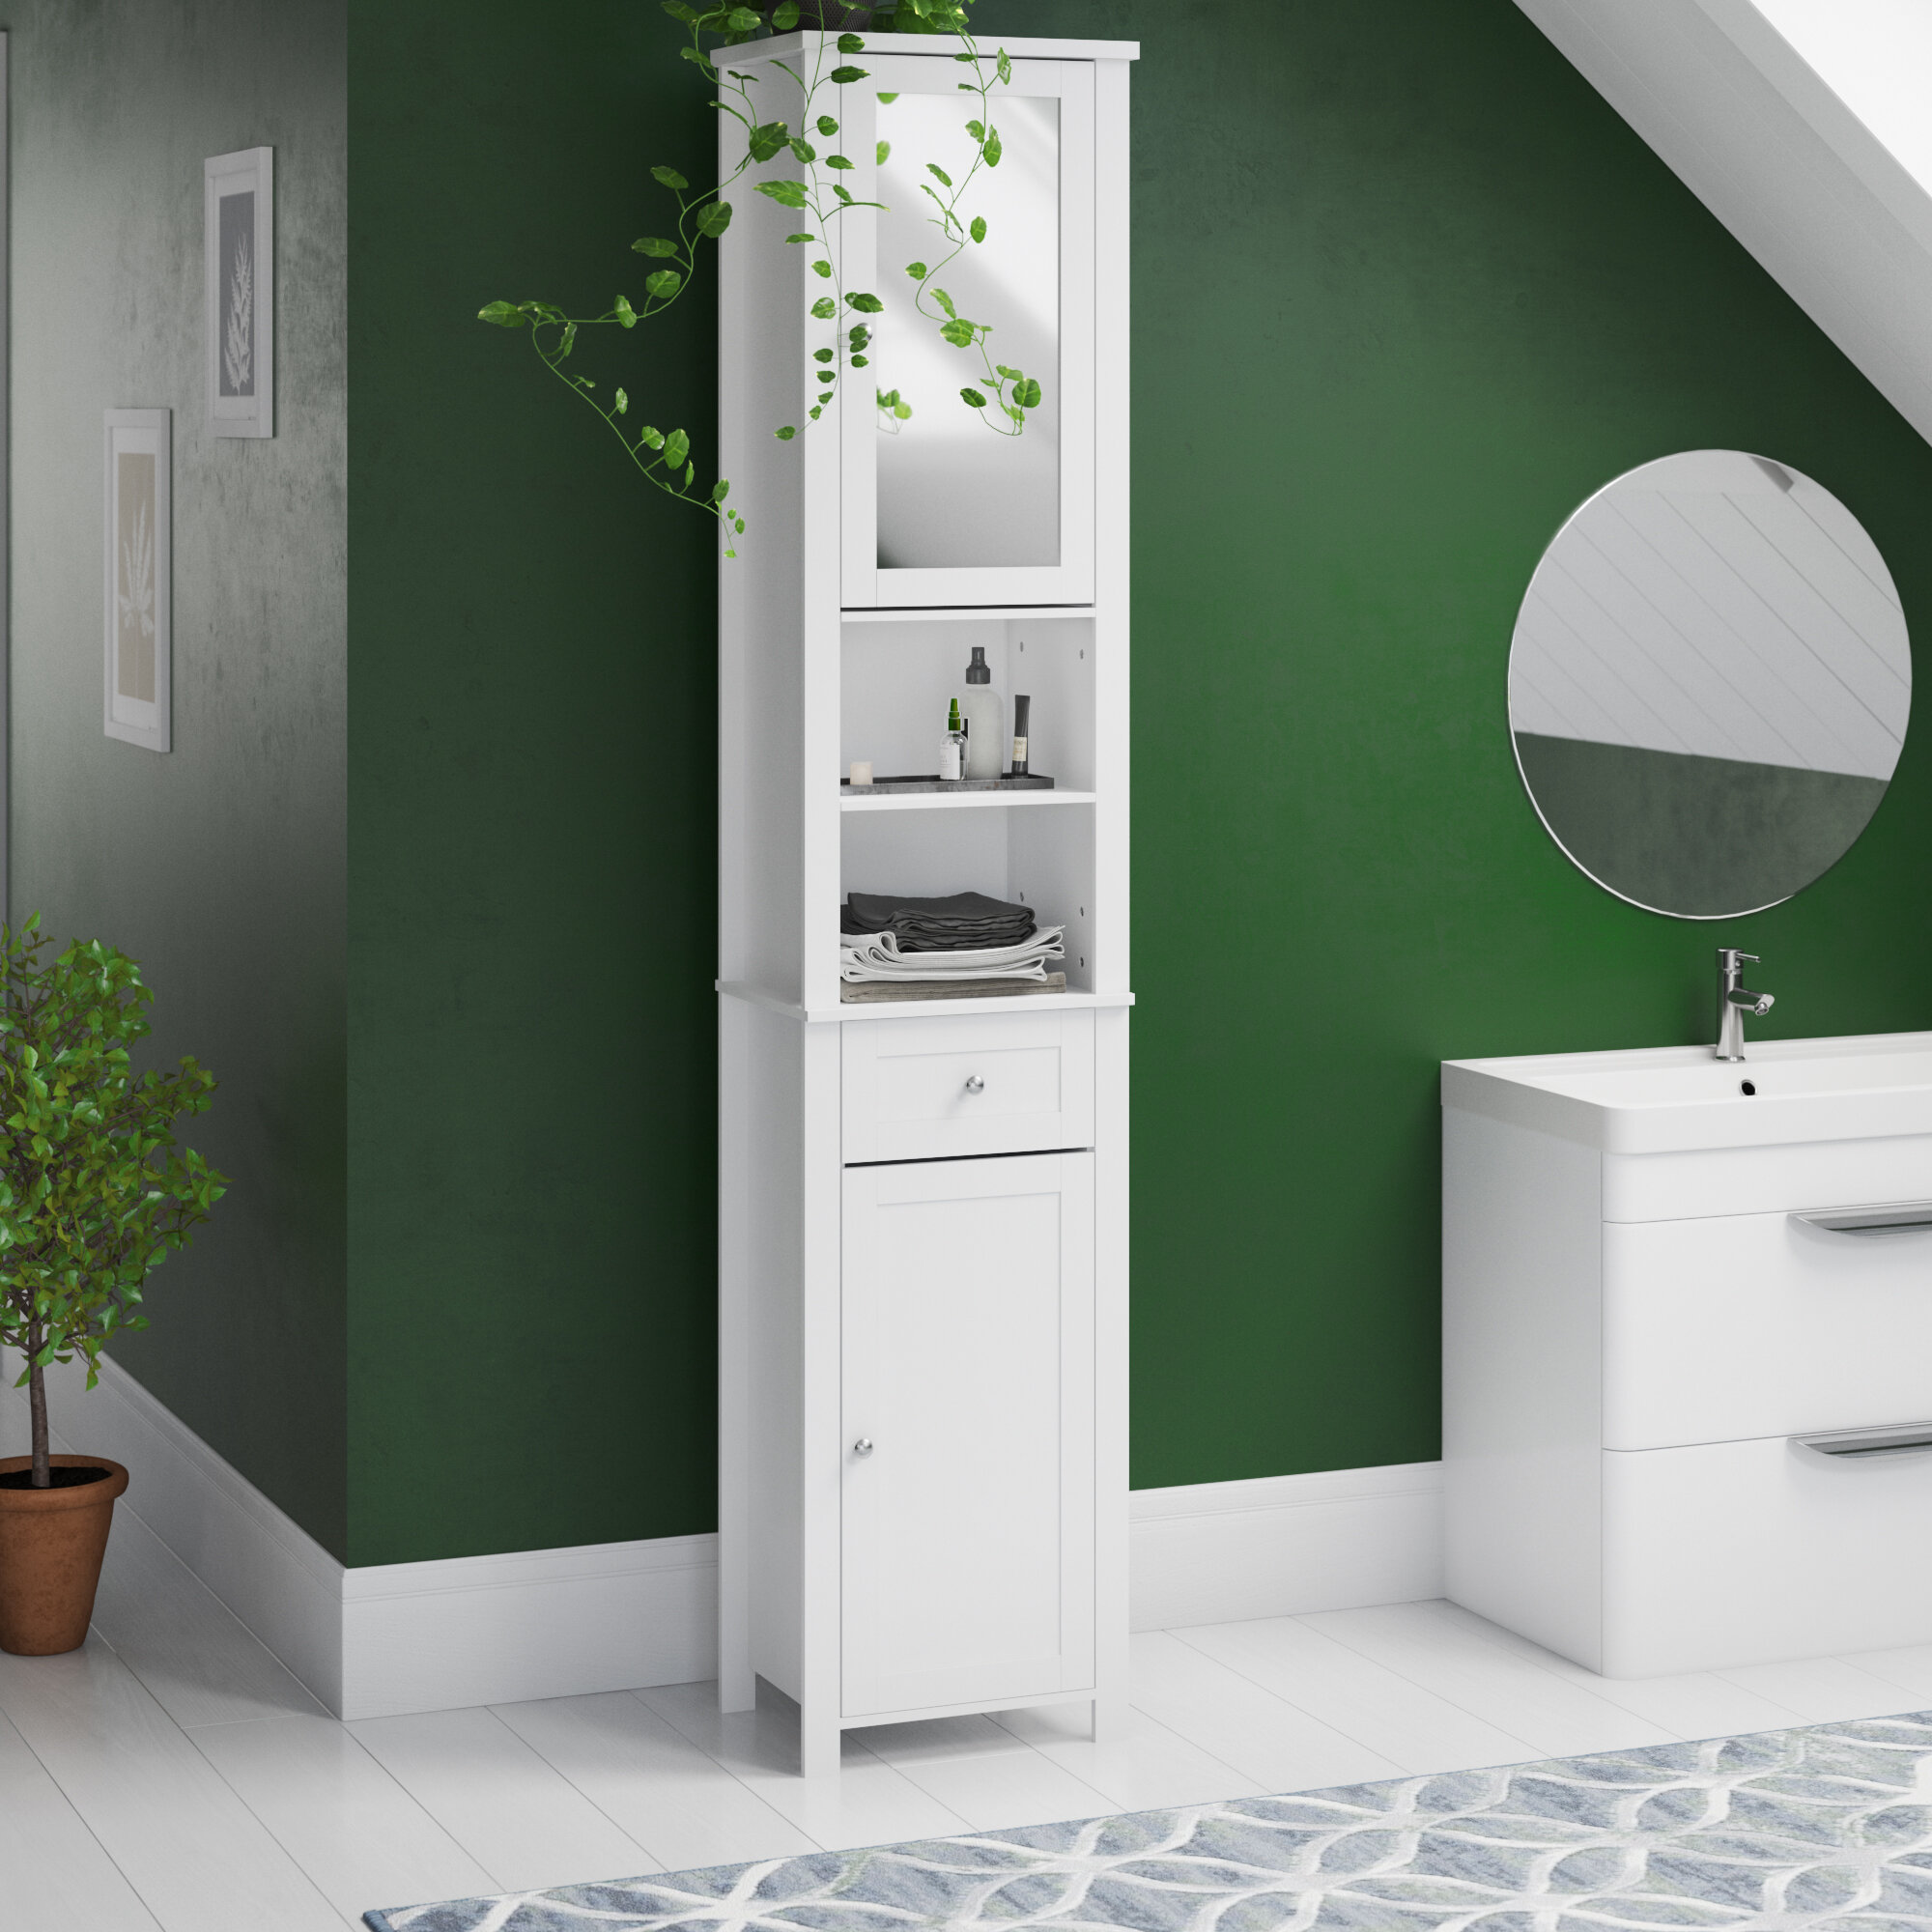 Free Standing Tall Bathroom